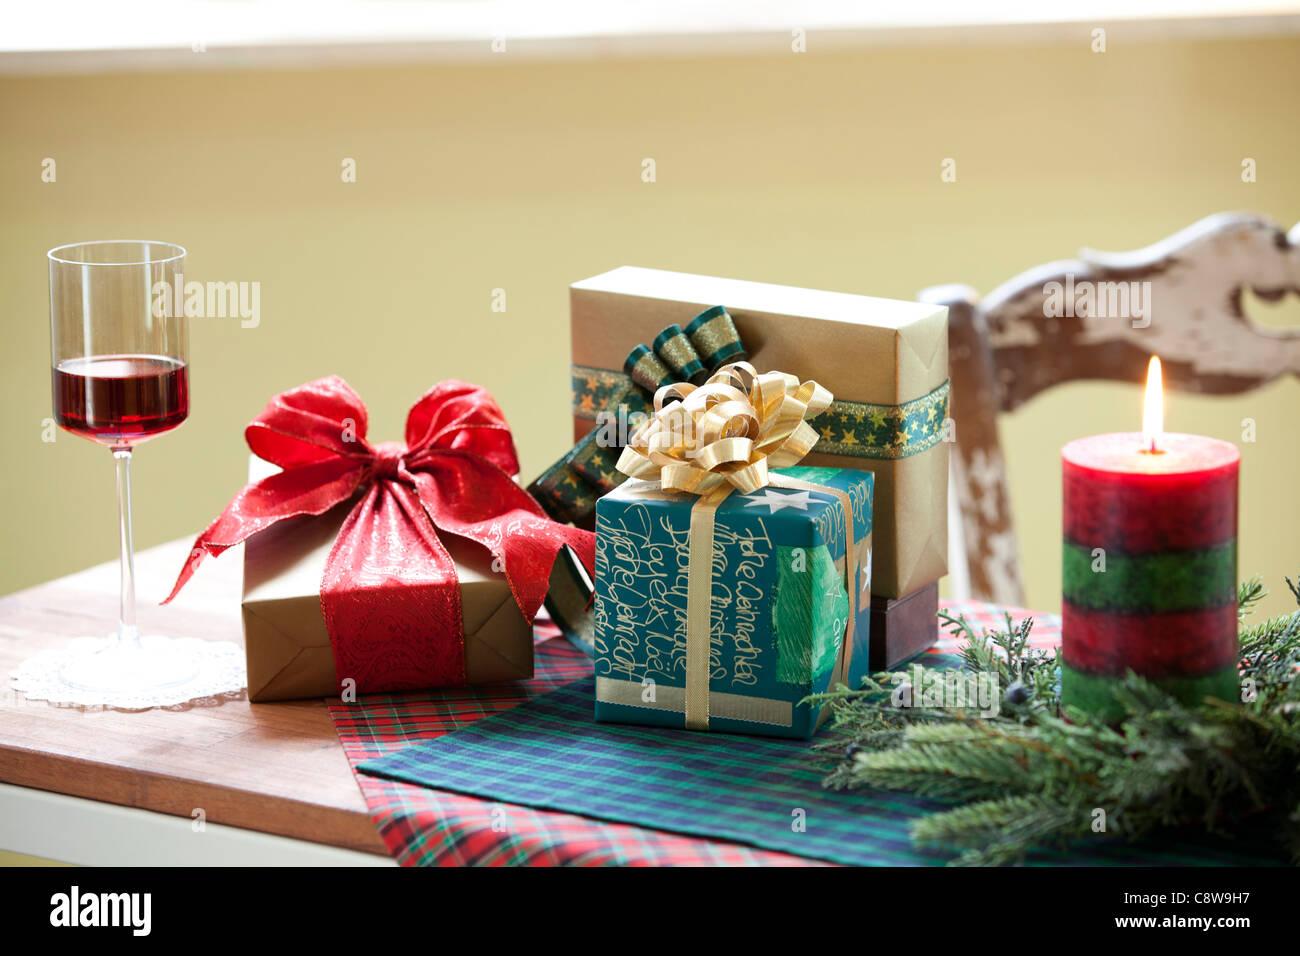 Decorative Christmas Candle, Wingless And Christmas Gift - Stock Image